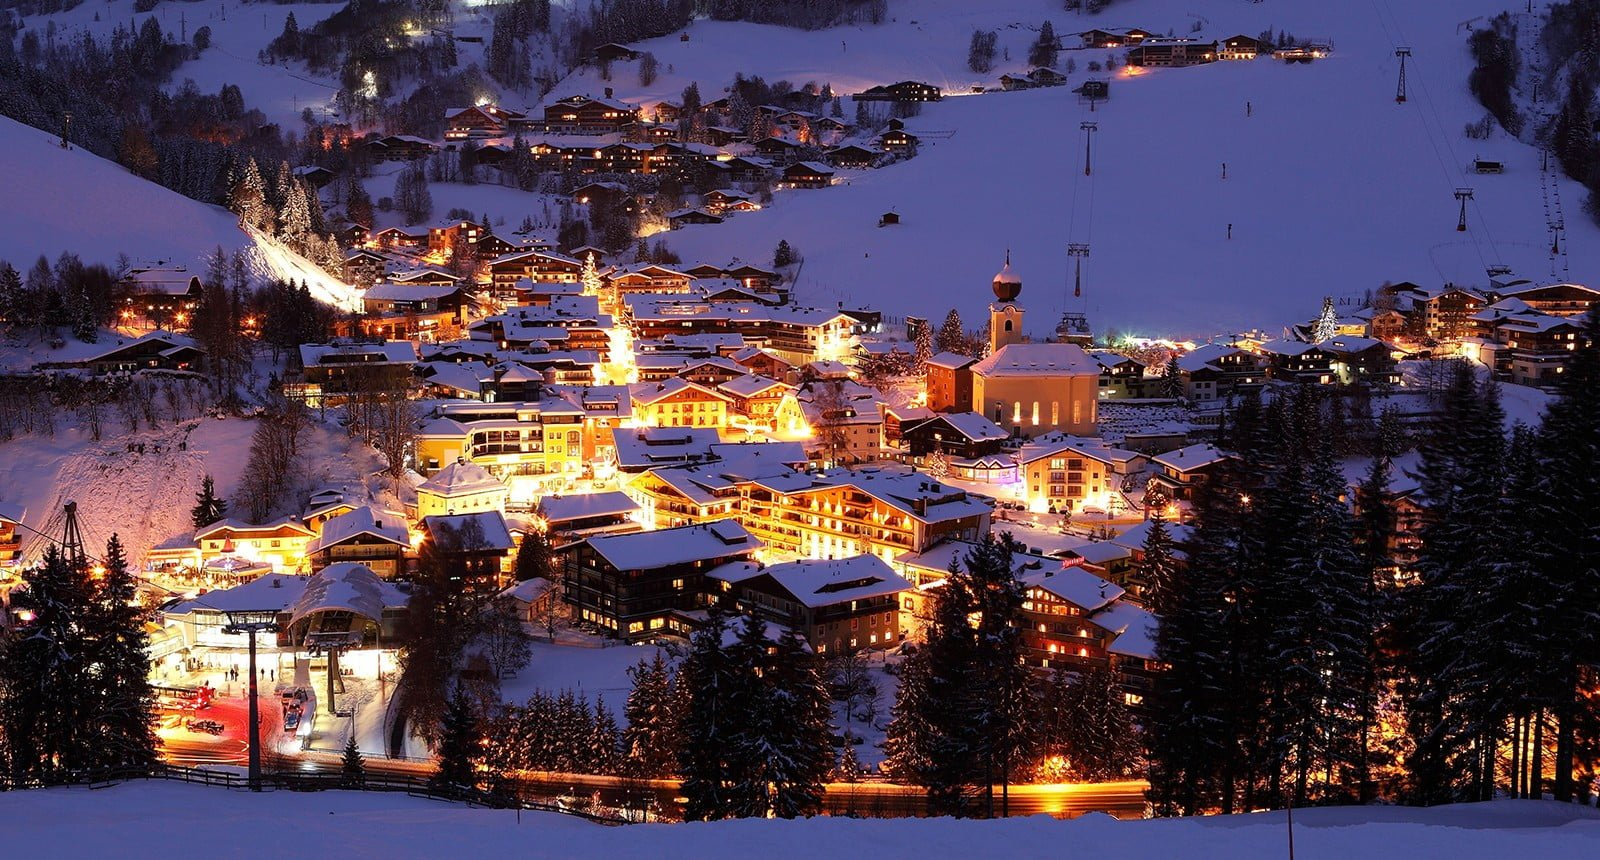 Saalbach winter